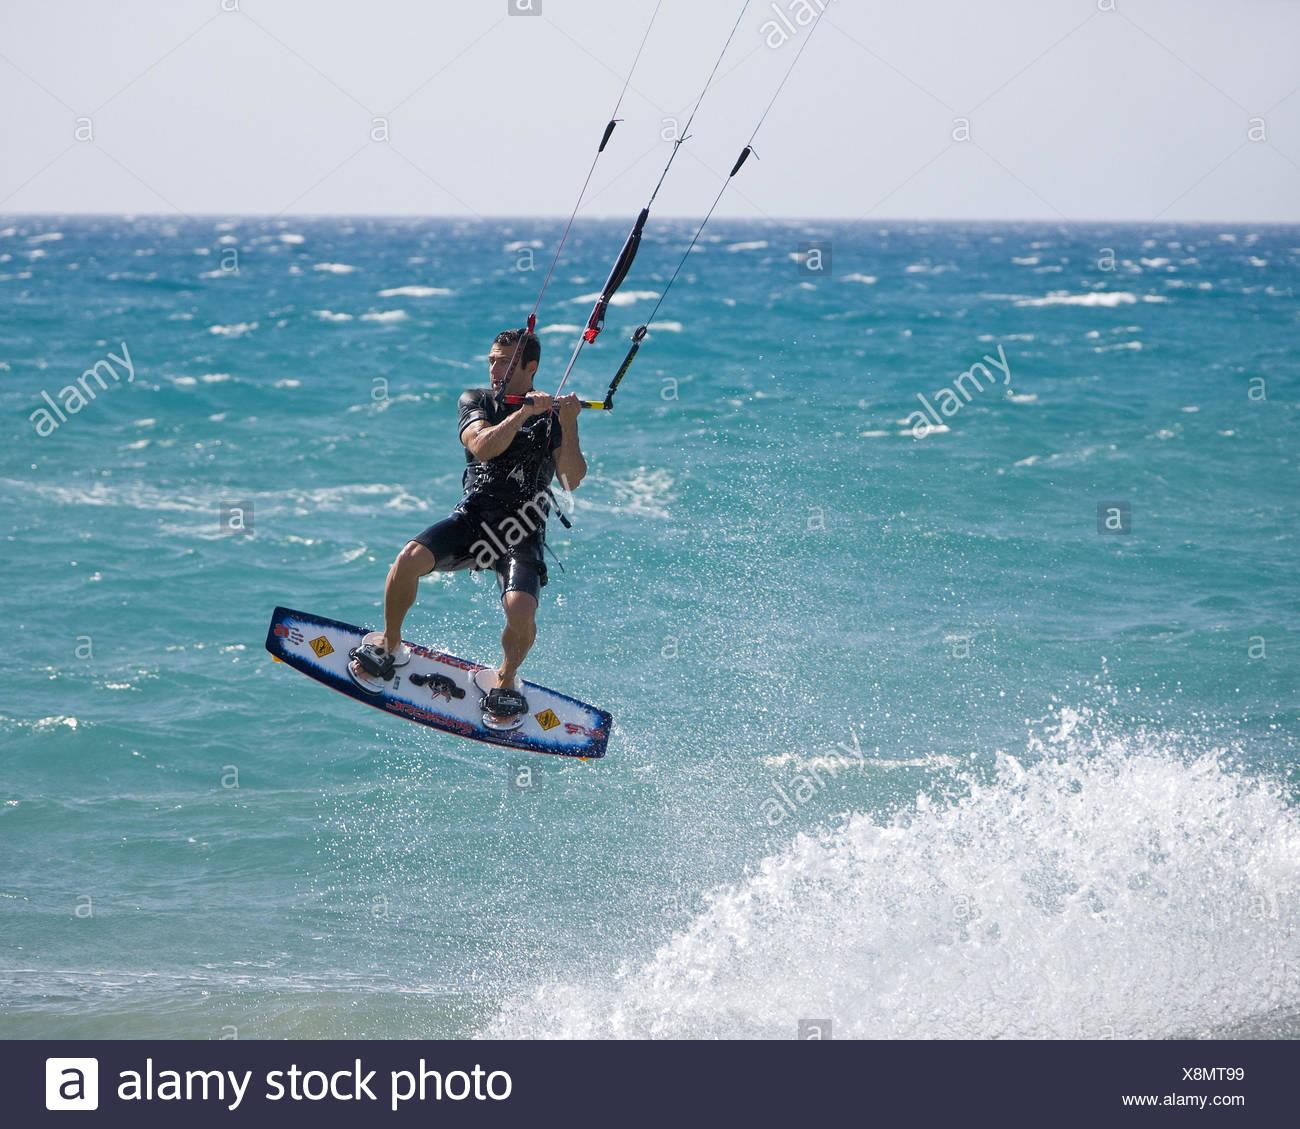 Cyprus, sea, Kitesurfer, crack, Europe, water sport, sport, person, man, surfer, water sportsman, Kitesurfen, surfboard, Kiteboarding, surf the internet, dragons, steering dragons, motion, dynamics, skill, skill, foam, the Mediterranean Sea, turquoise, water, horizon, - Stock Image